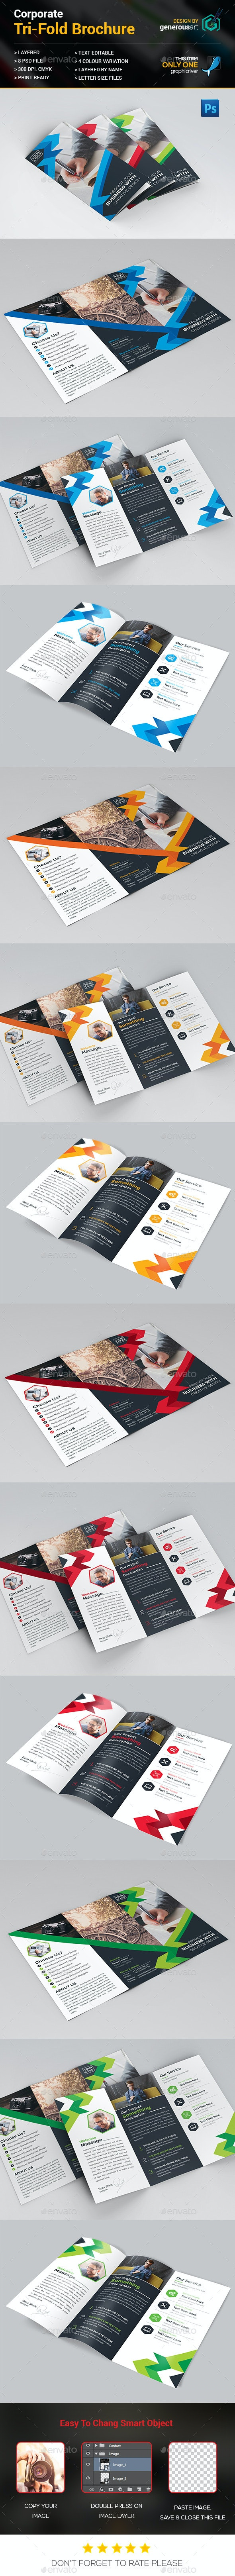 Max Tri-Fold Brochure - Corporate Brochures